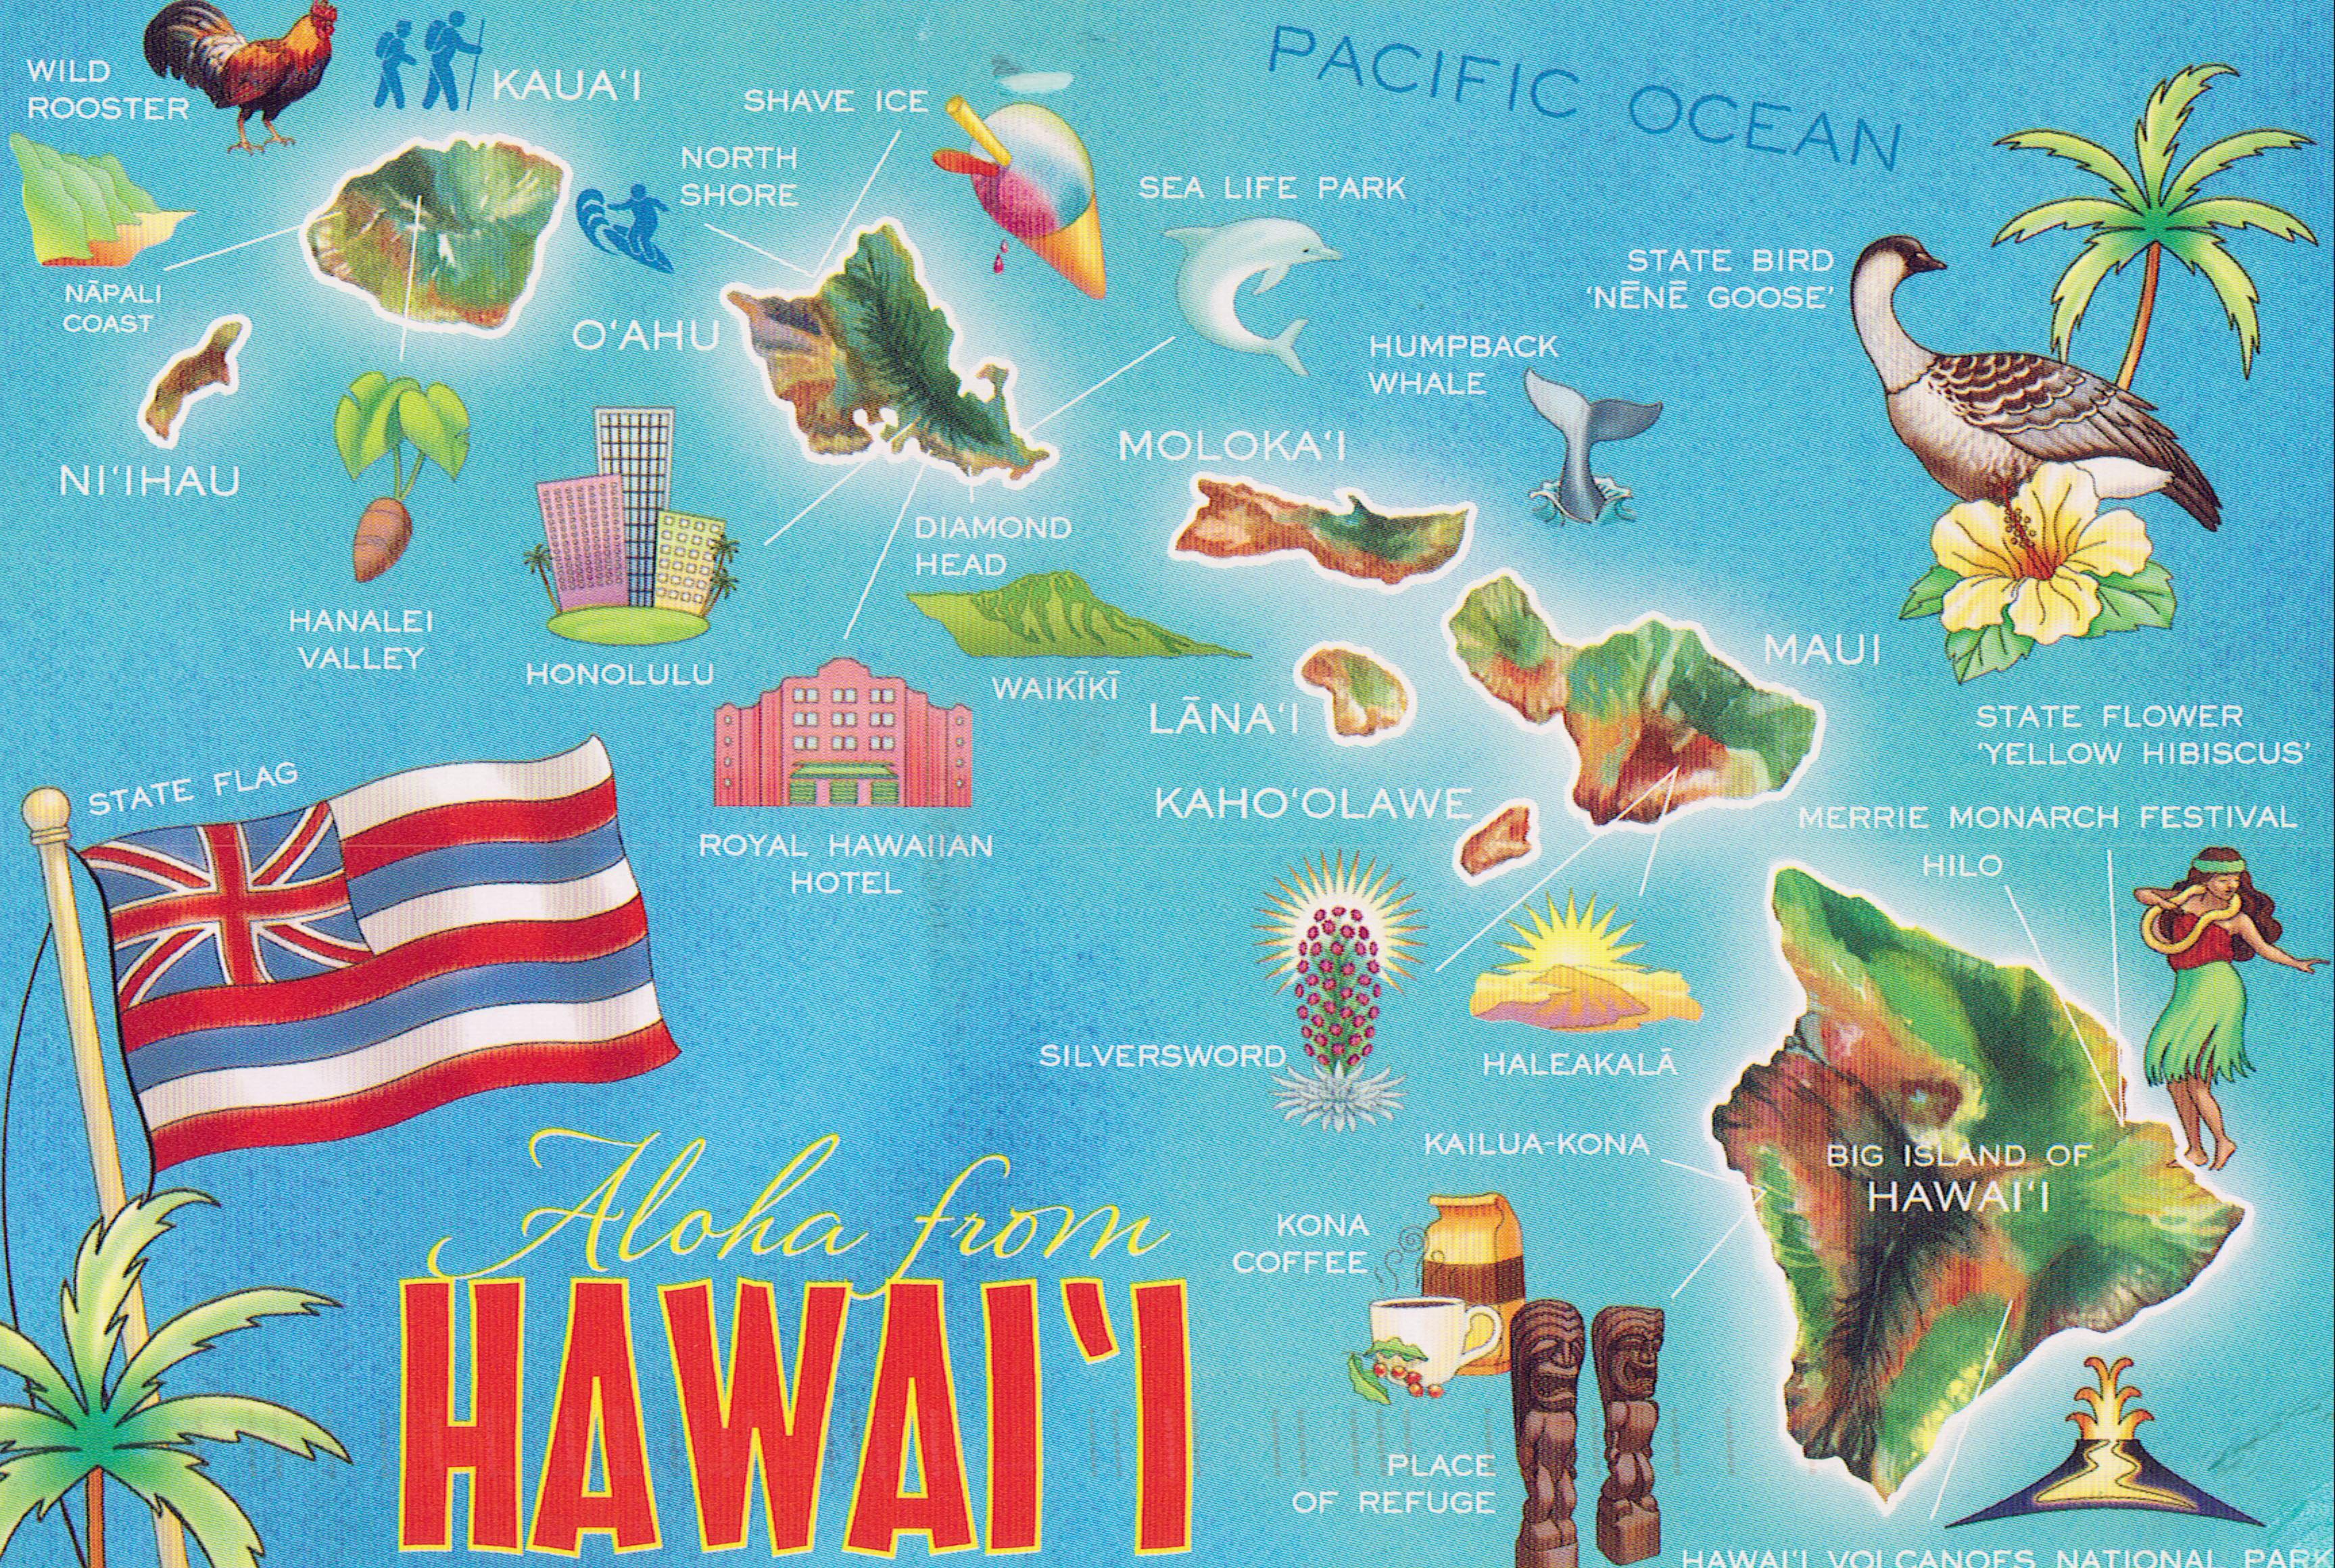 Large tourist map of Hawaii islands | Hawaii state | USA